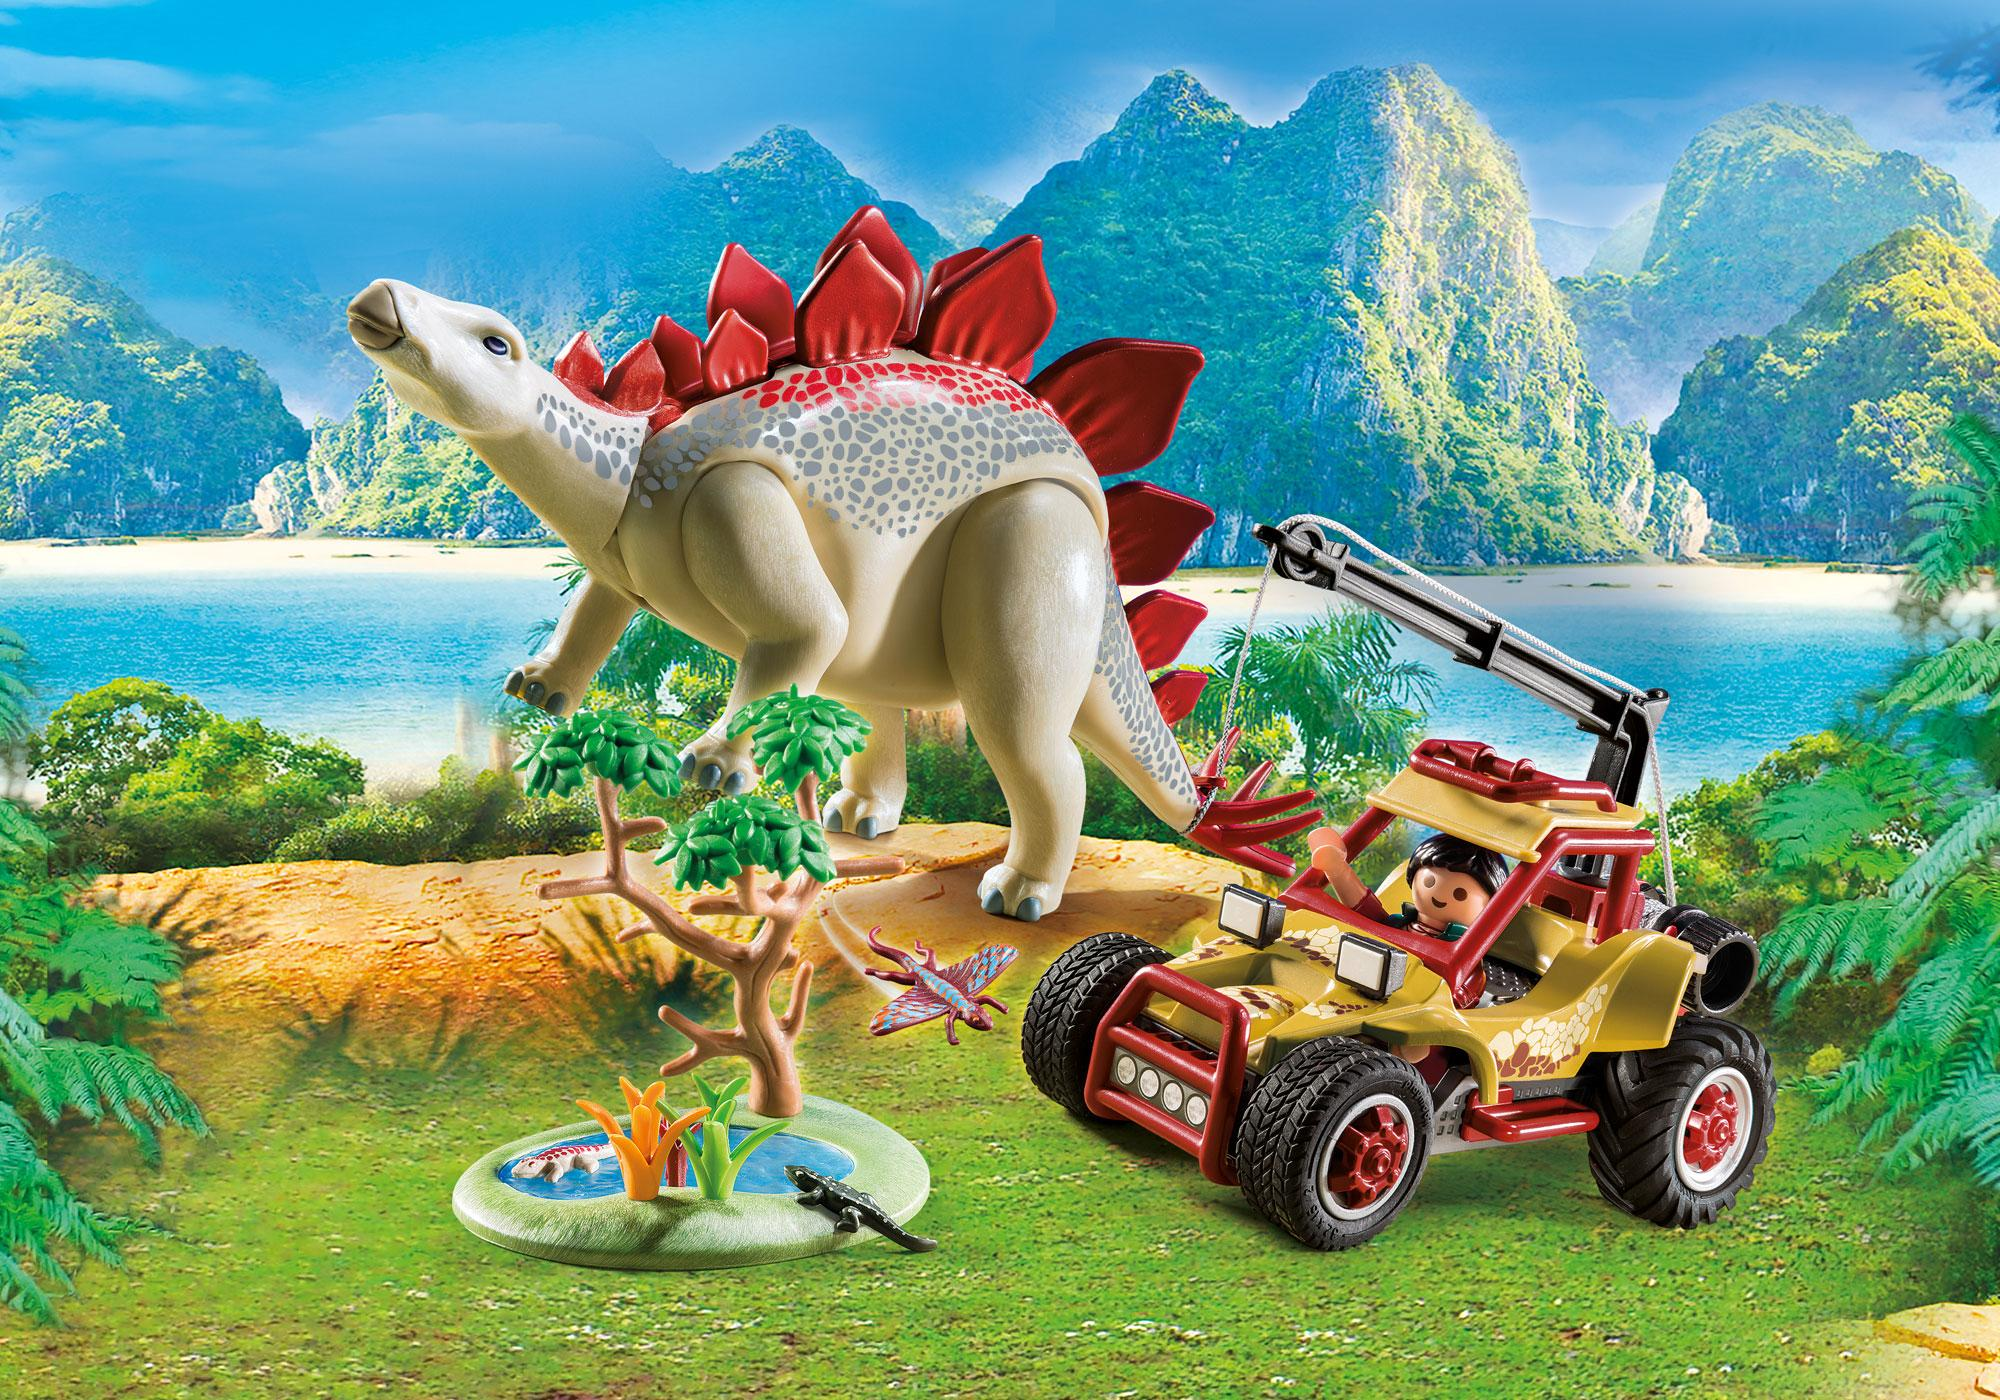 9432_product_detail/Forschermobil mit Stegosaurus